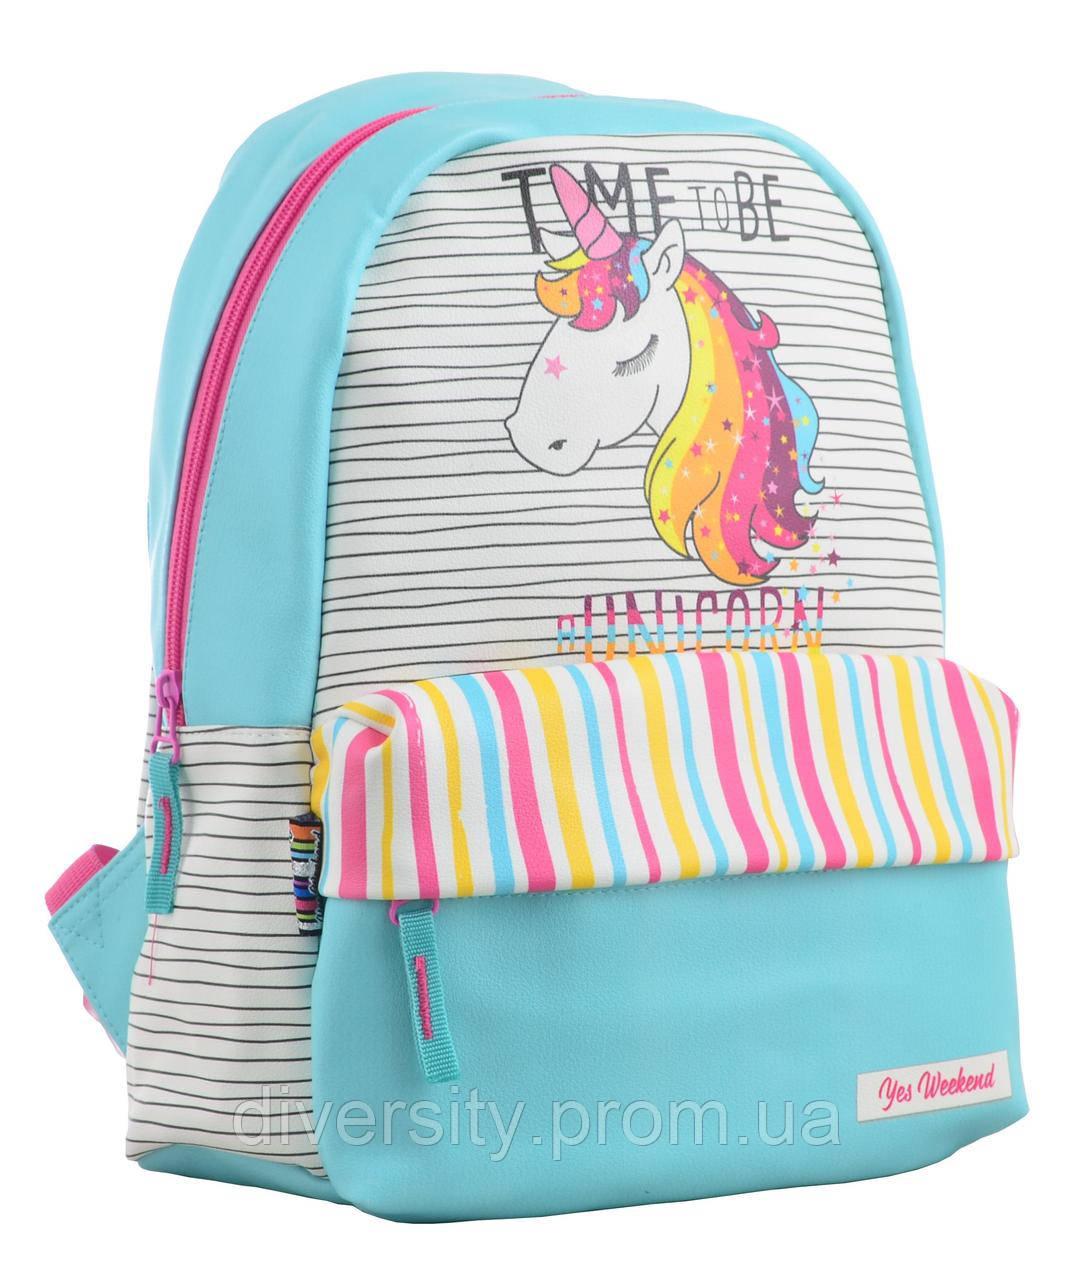 Молодежный рюкзак  YES ST-28 Unicorn,  34*24*13.5